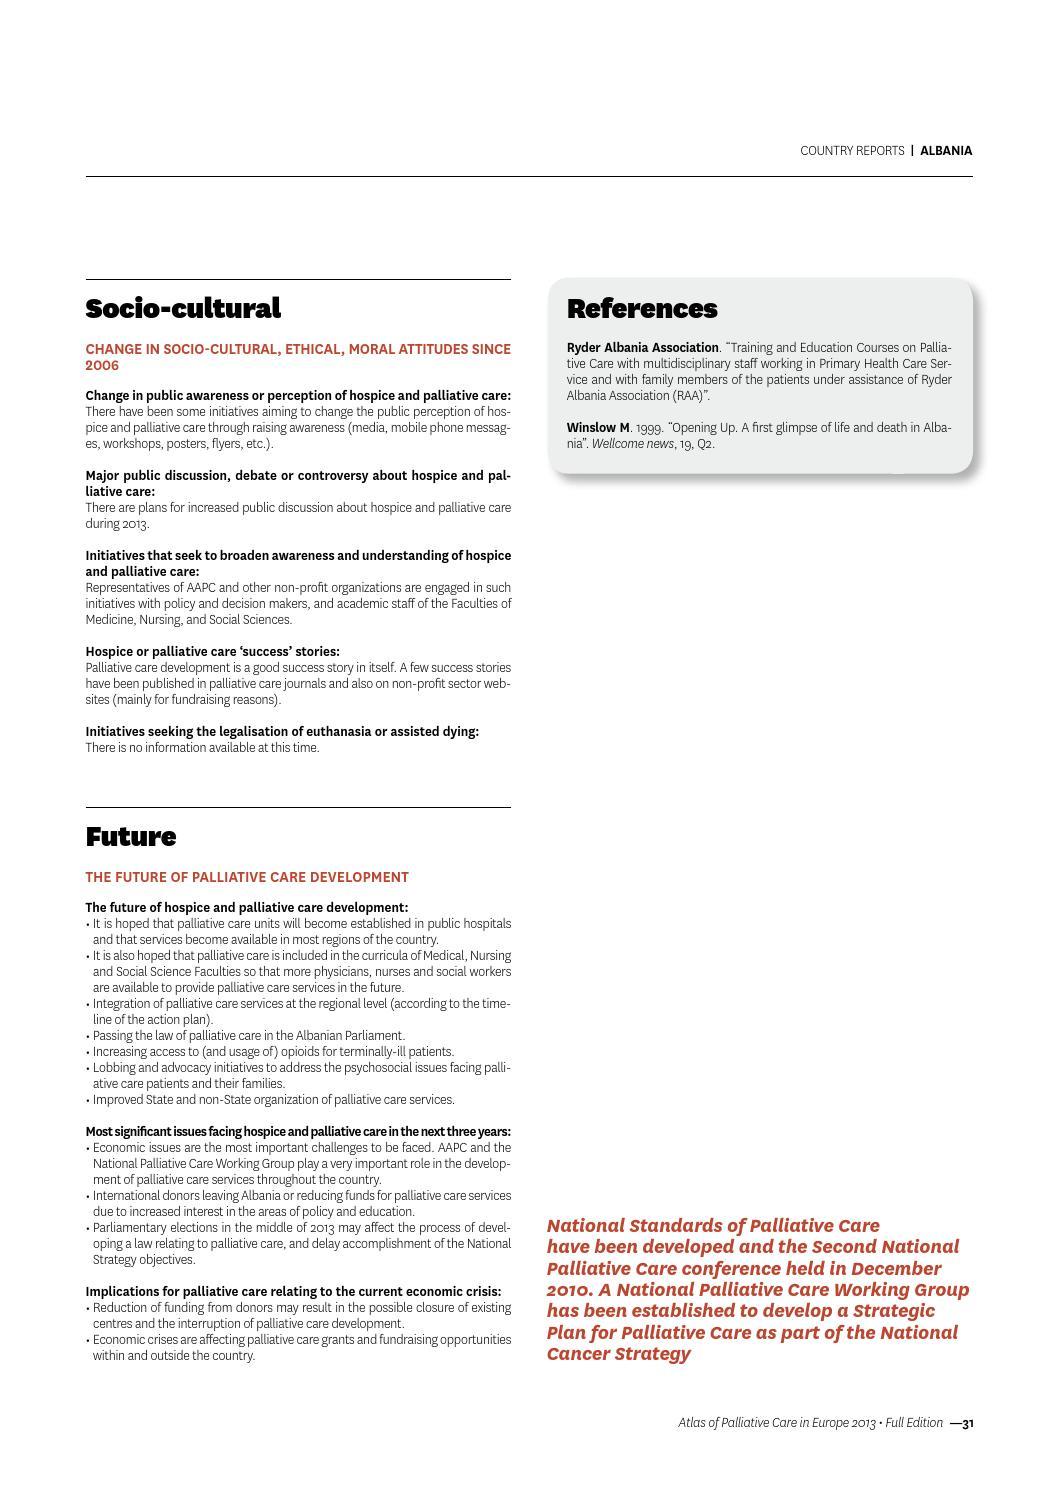 EAPC Atlas of Palliative Carein Europe 2013 by